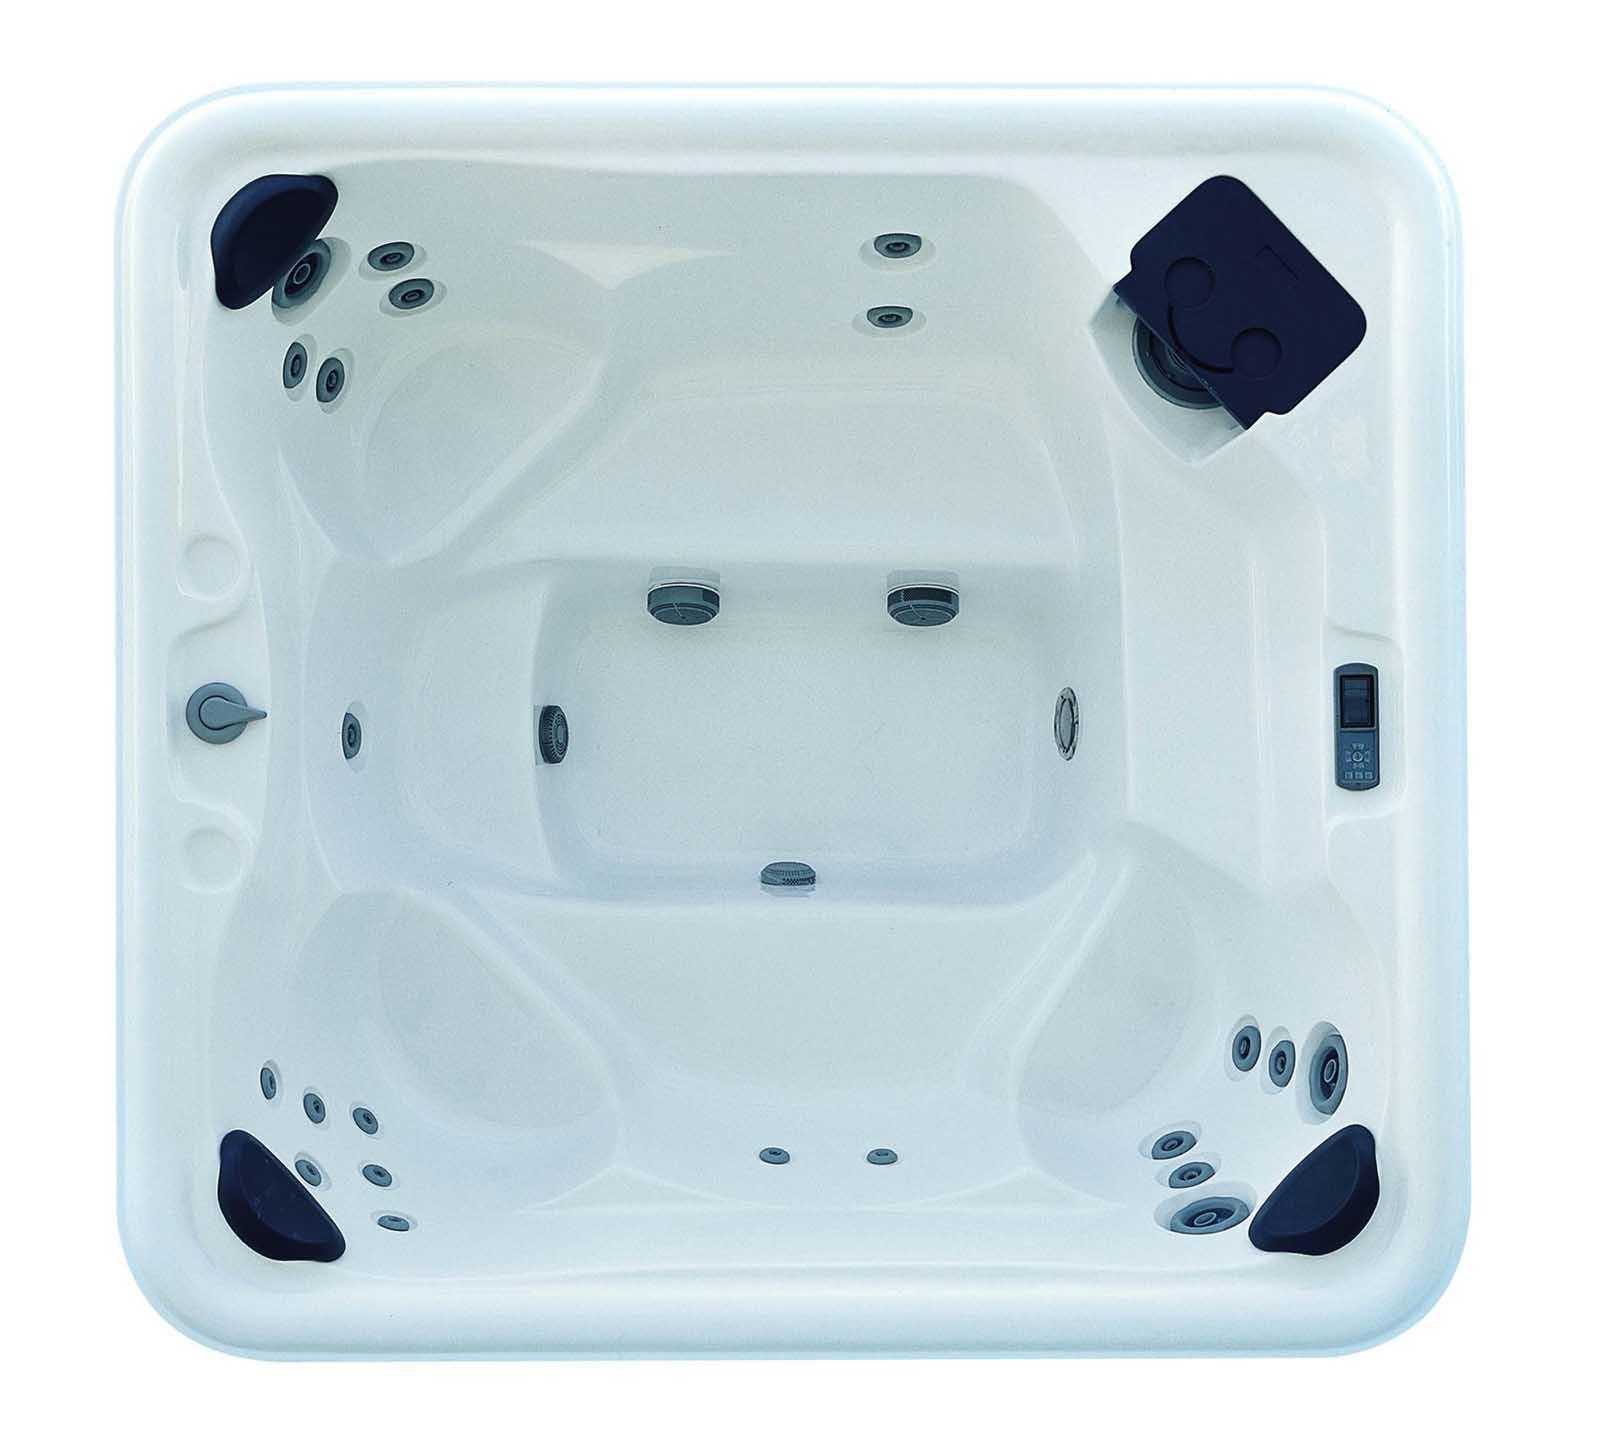 Outdoor Spa Whirlpool Massage Bathtub (Открытый Спа Whirlpool массажные ванны)